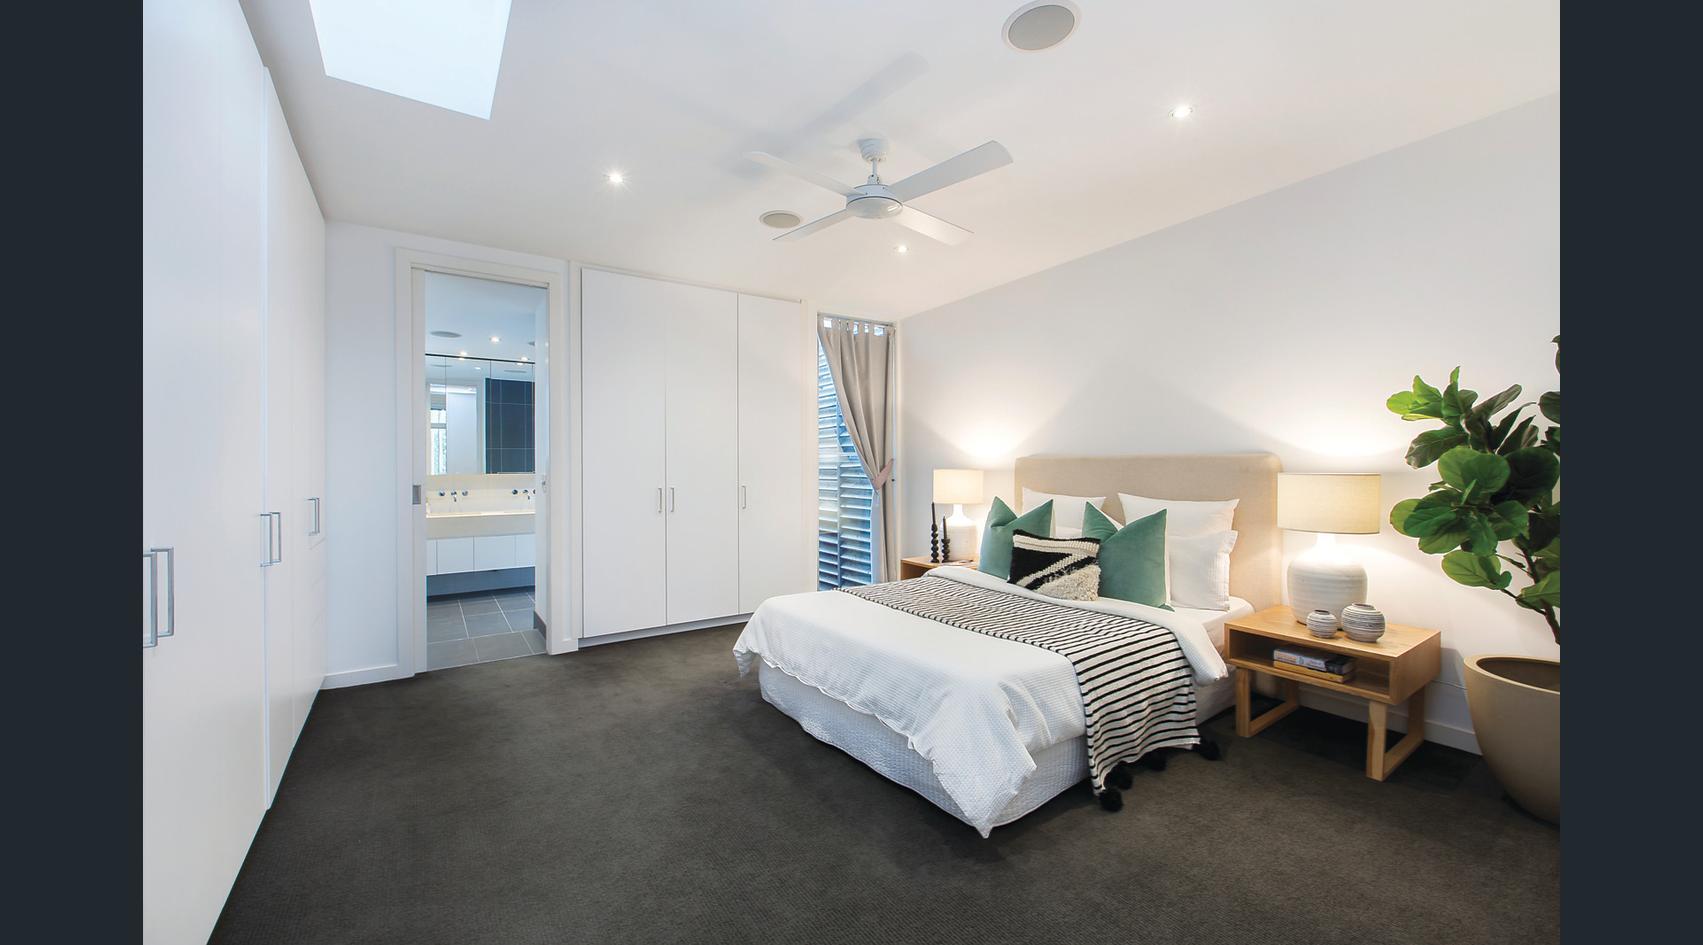 178-farrell-street-port-melbourne-student-accommodation-Melbourne-Vedroom-Unilodgers